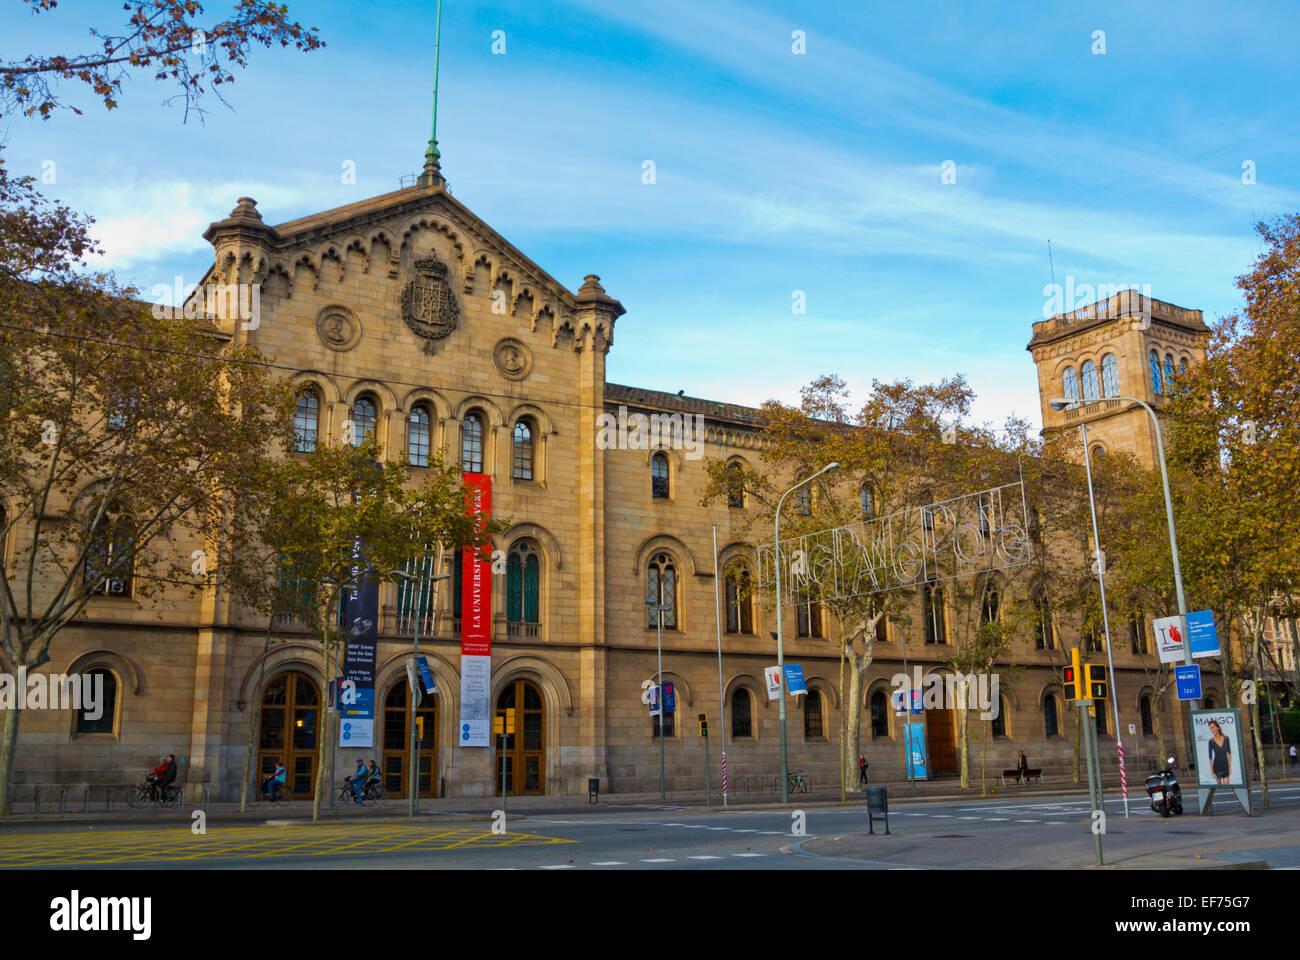 Neogothic style universitat de Barcelona main building (1869), Placa Universitat, Barcelona, Spain - Stock Image